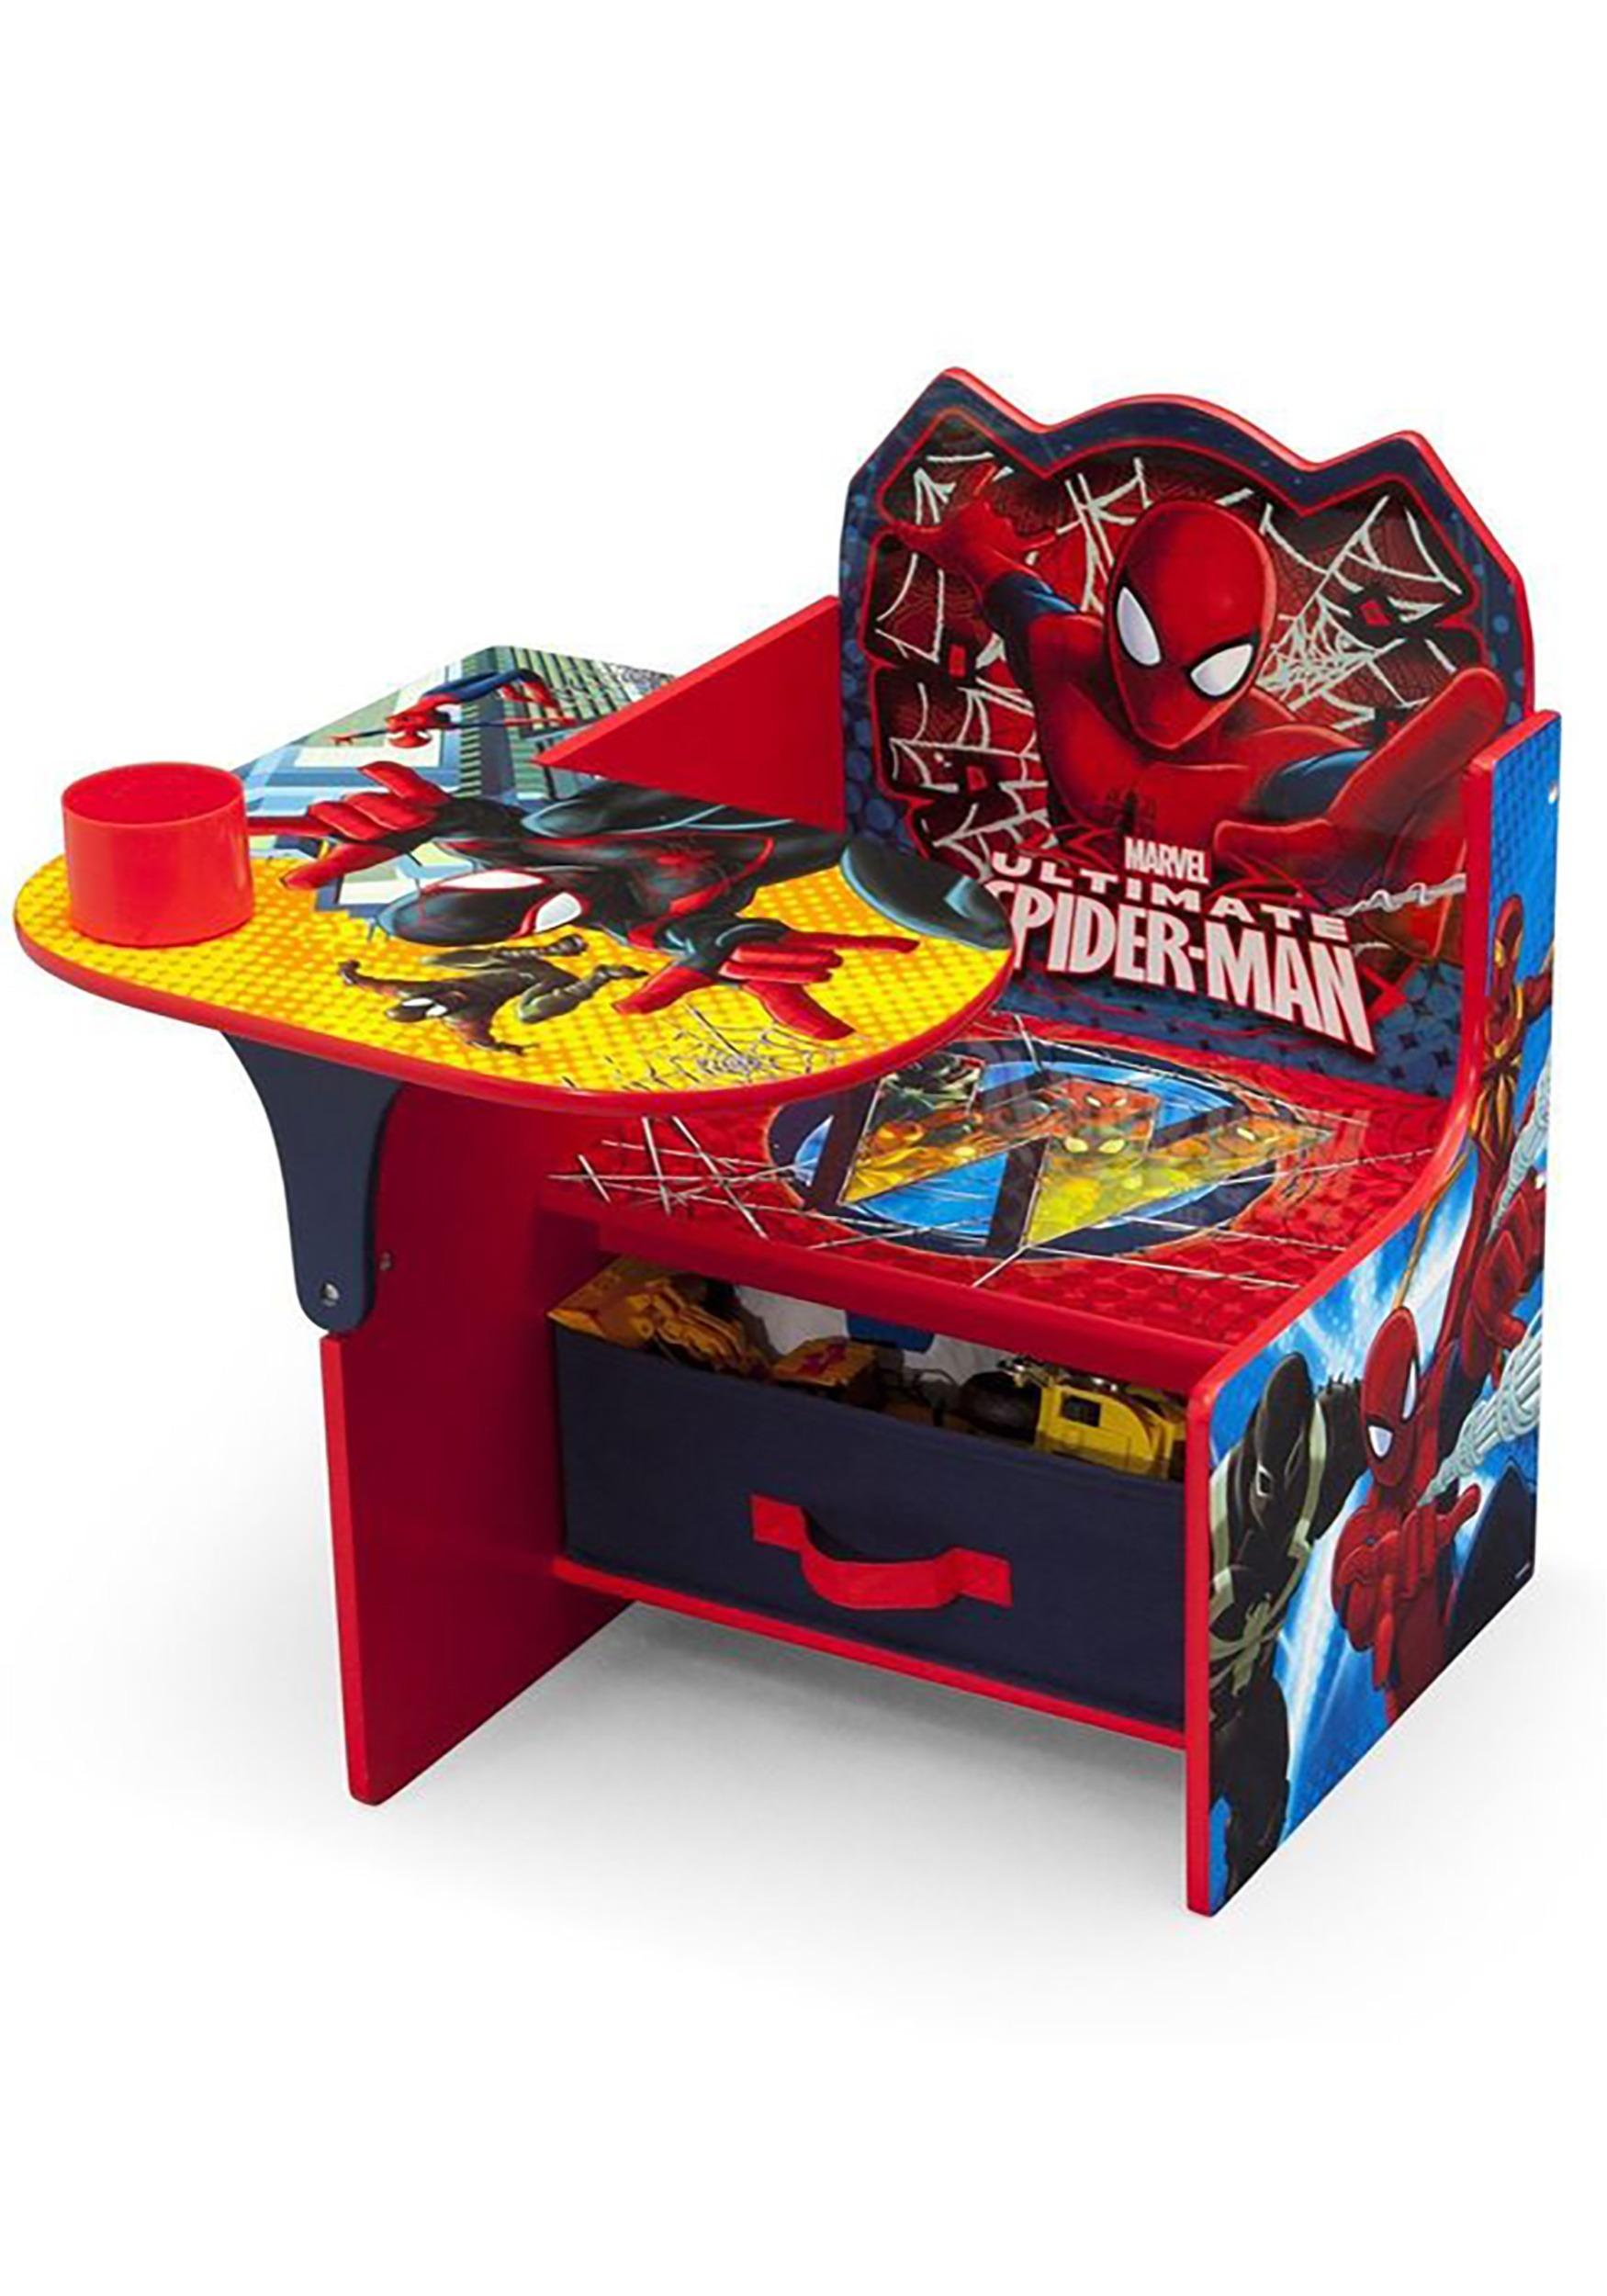 Awe Inspiring Spider Man Chair Desk With Storage Bin Creativecarmelina Interior Chair Design Creativecarmelinacom